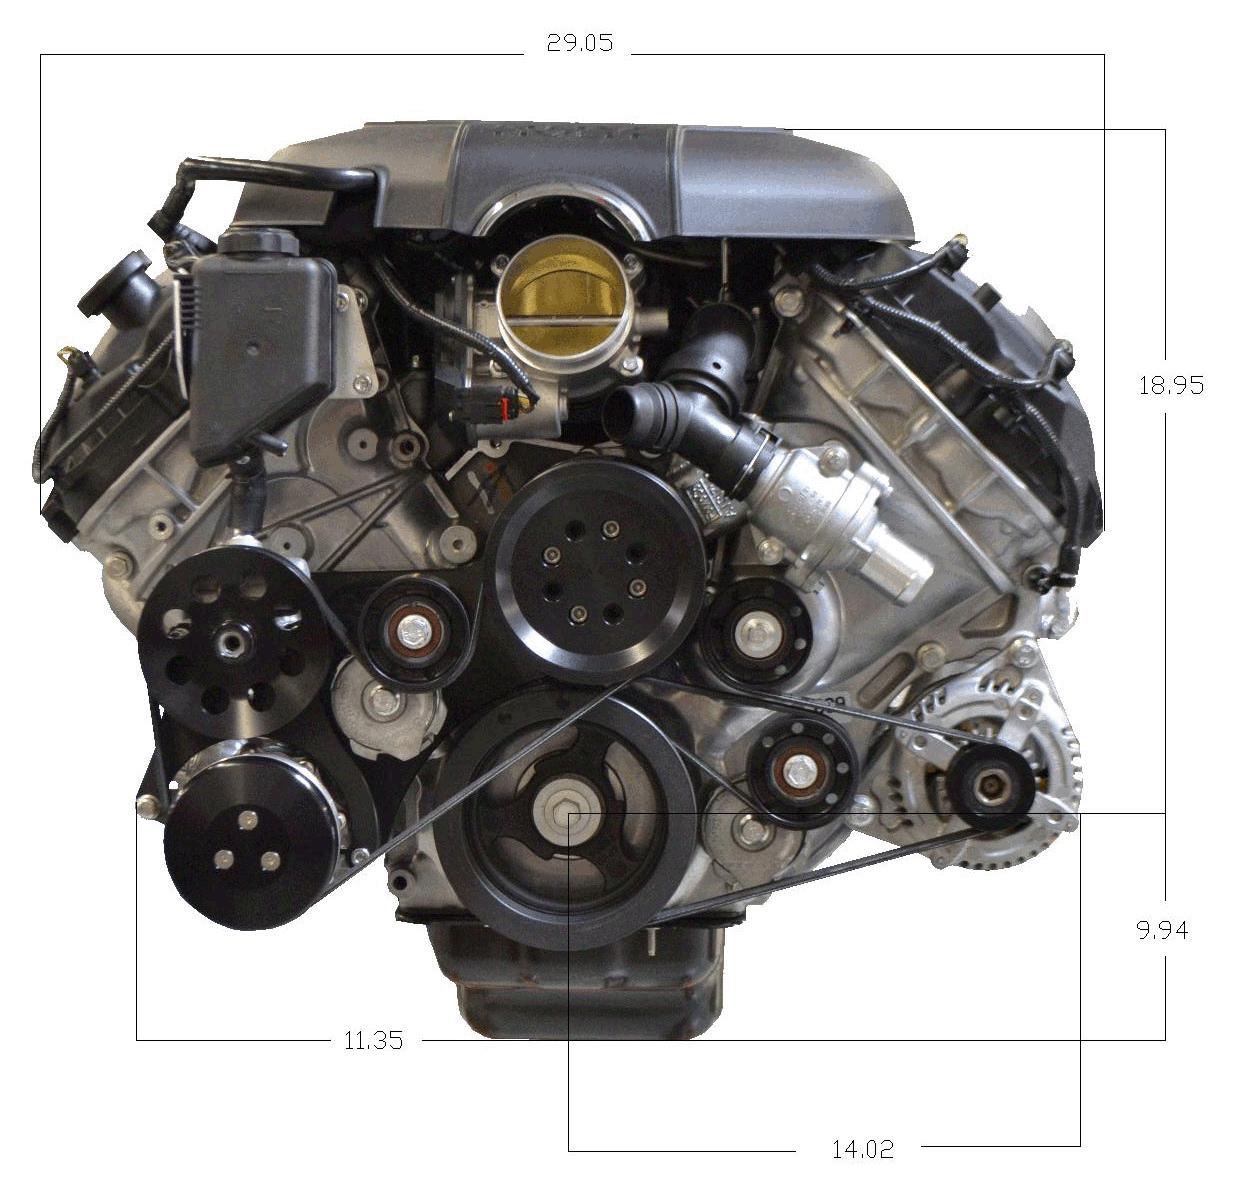 Ford Racing Parts: Mustang Power Packs, Crate Engines, Motors